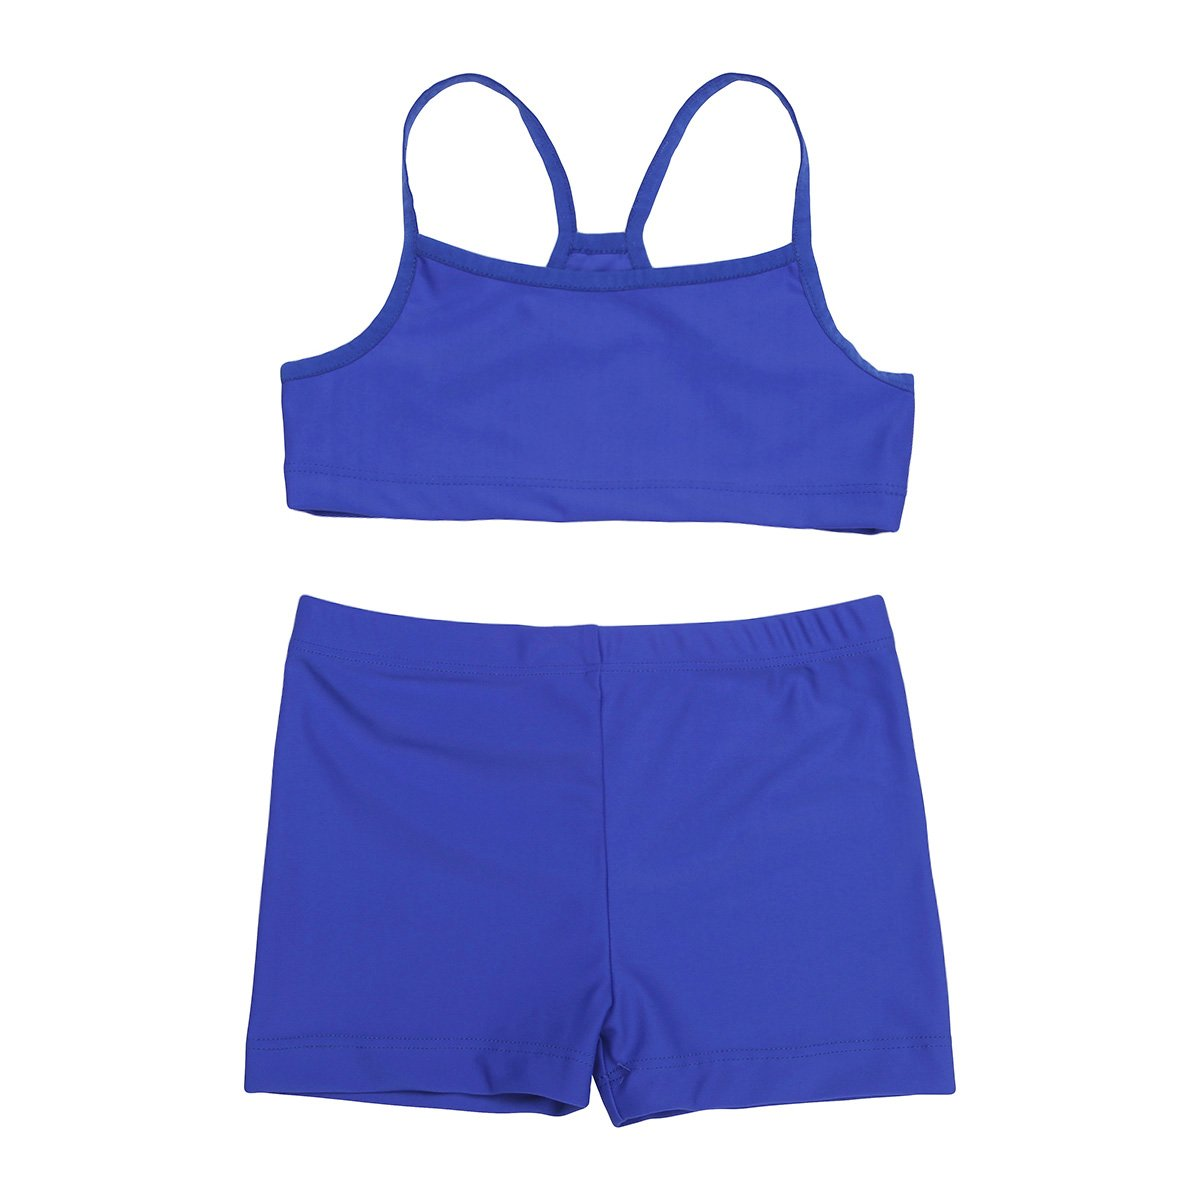 MSemis Kids Girls 2PCS Tankini Straps Tank Tops with Bottoms Gymnastics Sports Workout Swimwear